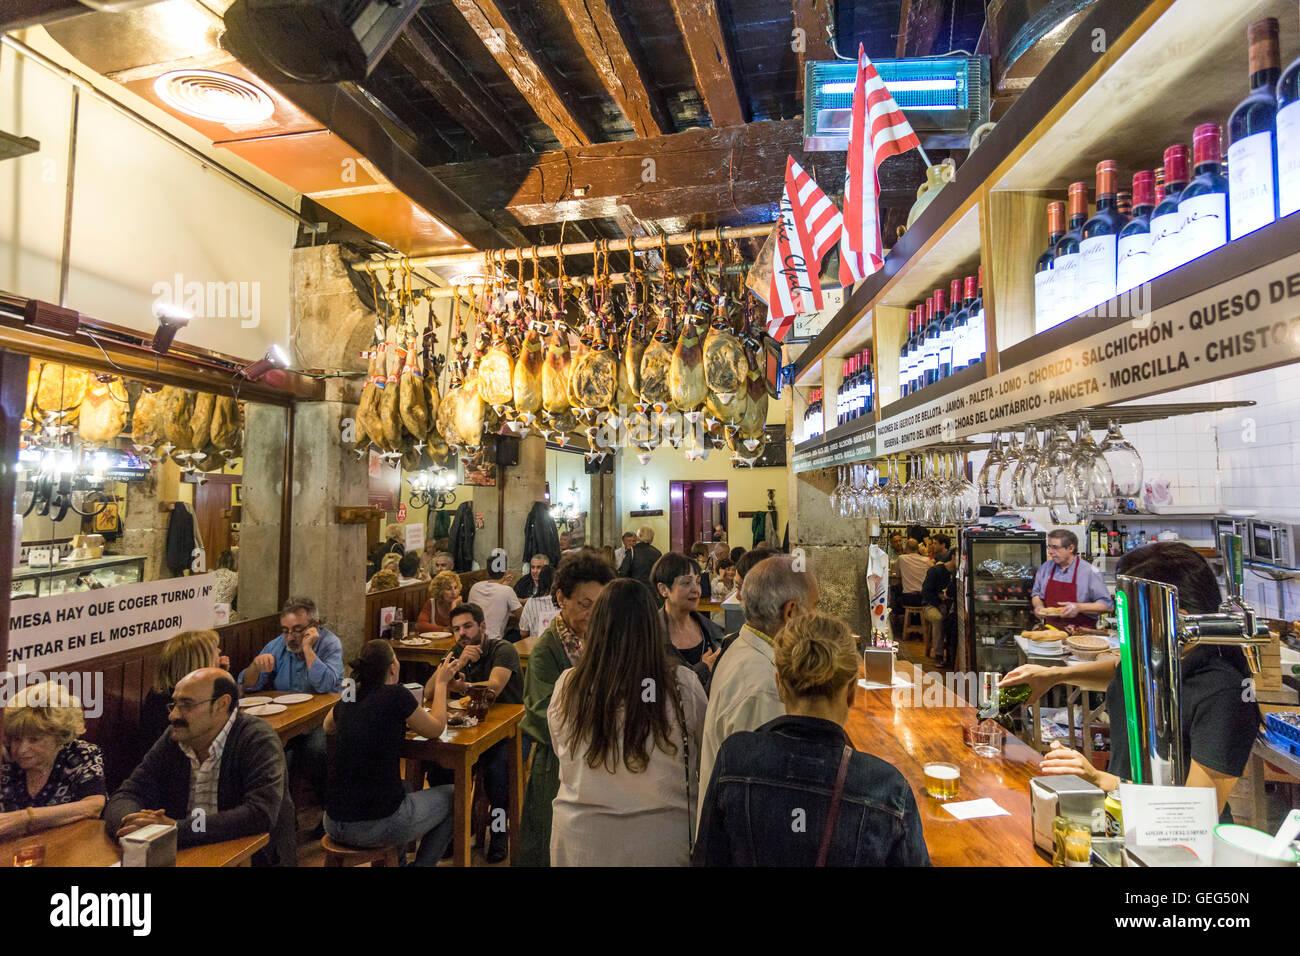 Tapaz Bar in Bilbao, Plaza Nueva,  Basque Country, Spain - Stock Image